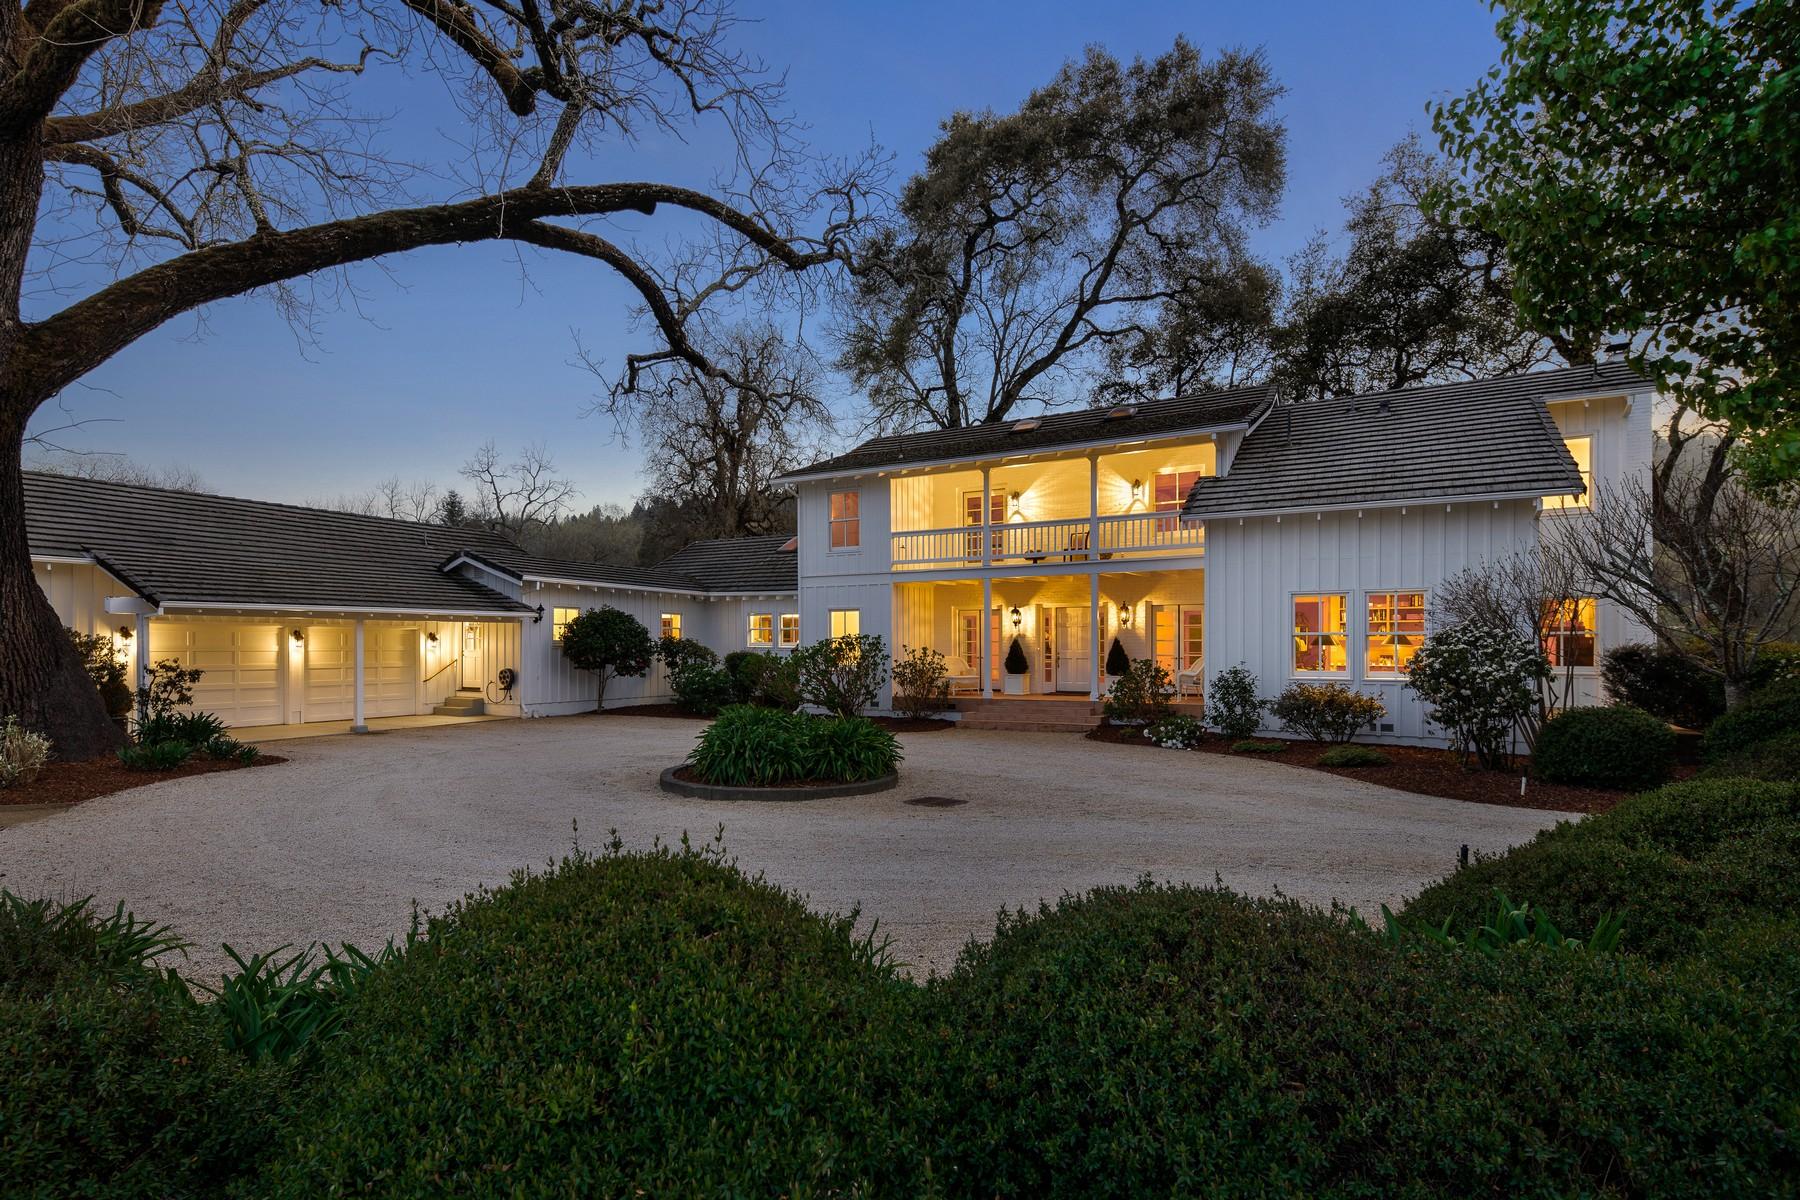 Vineyard Real Estate for Active at Dry Creek Creekside Estate 2950 Dry Creek Road Healdsburg, California 95448 United States